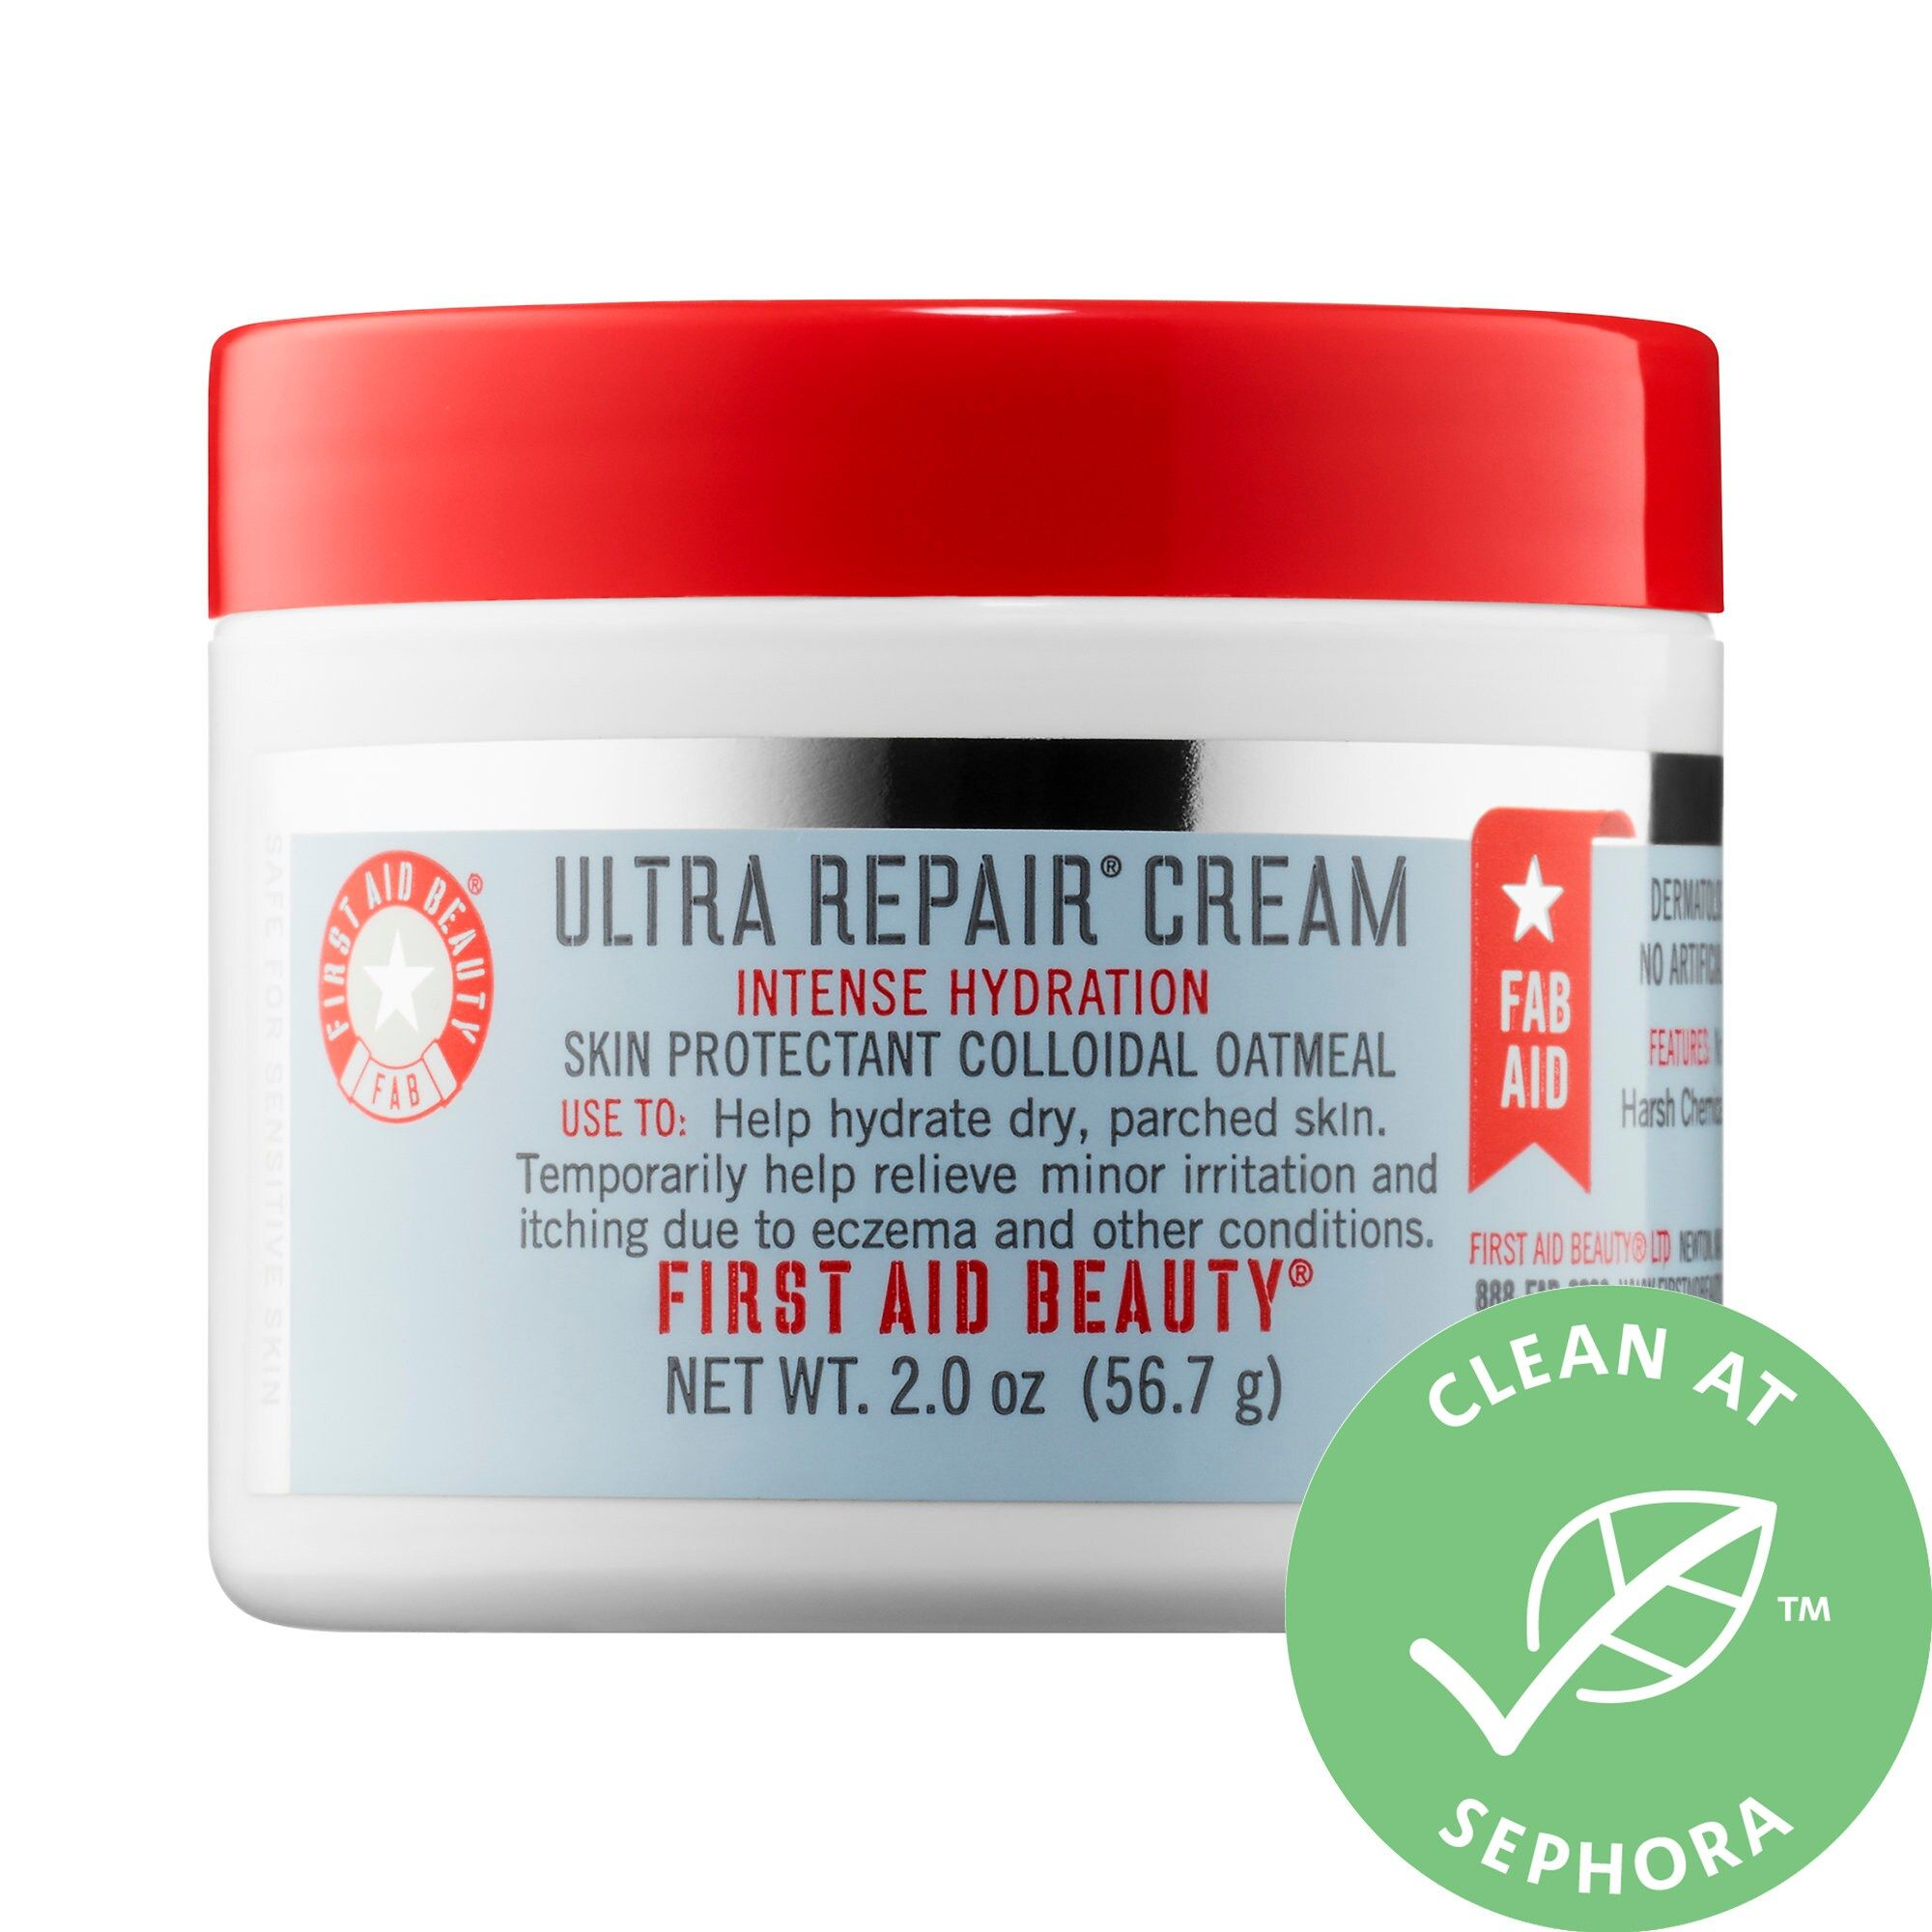 Mini Ultra Repair Cream Intense Hydration First Aid Beauty Sephora Repair Cream First Aid Beauty Soothing Moisturizer